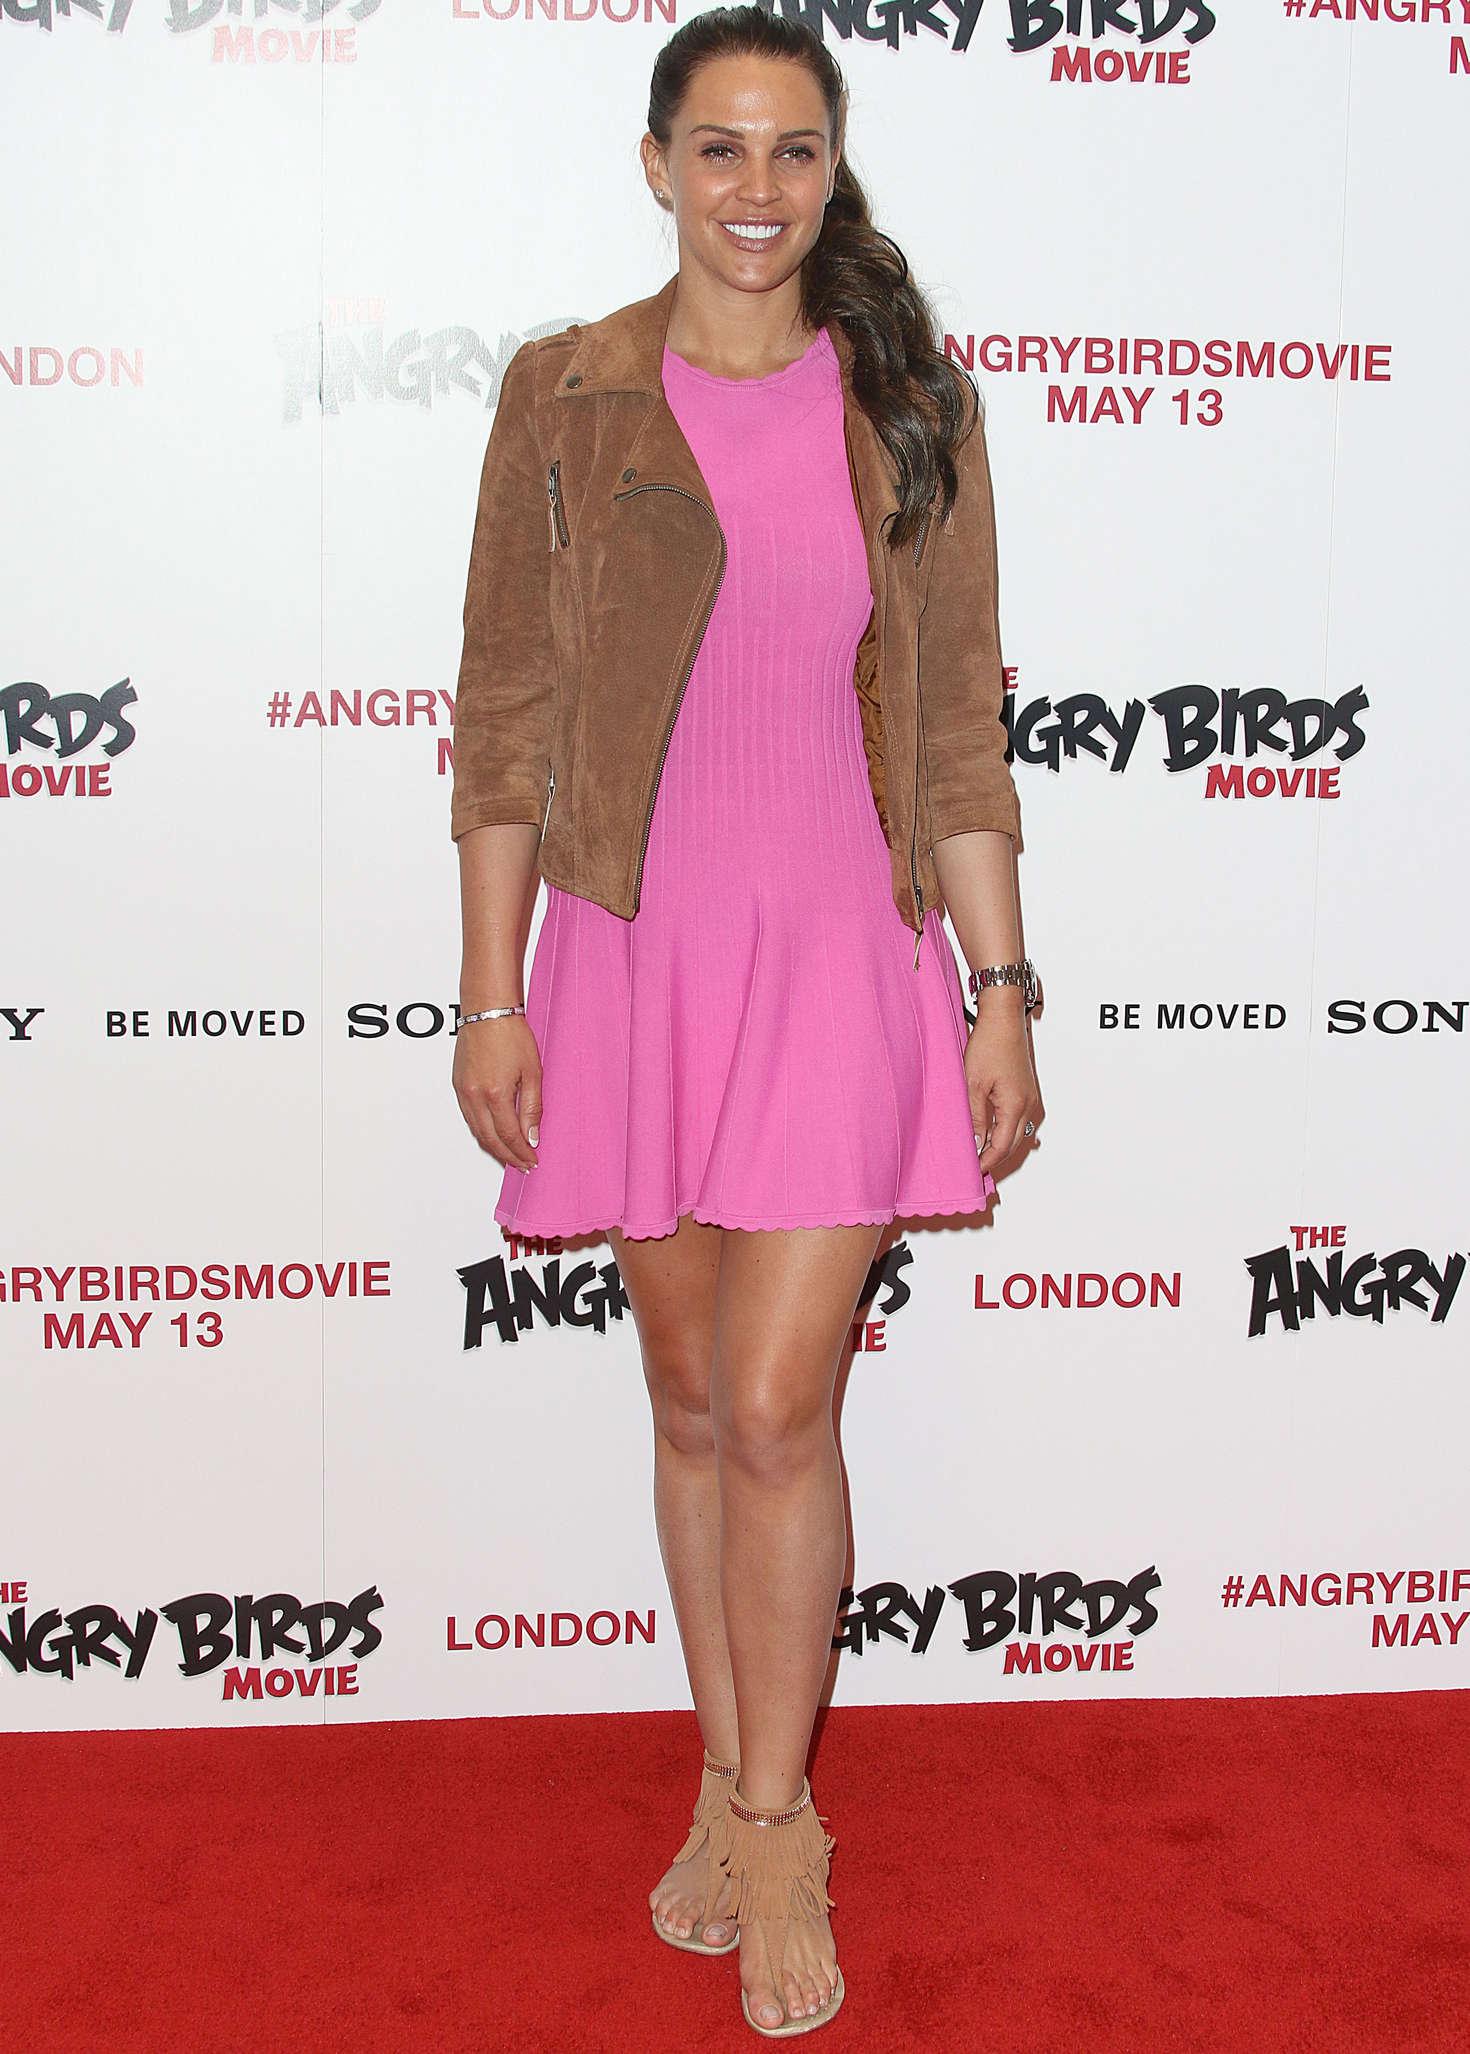 Danielle Lloyd The Angry Birds Gala Screening in London